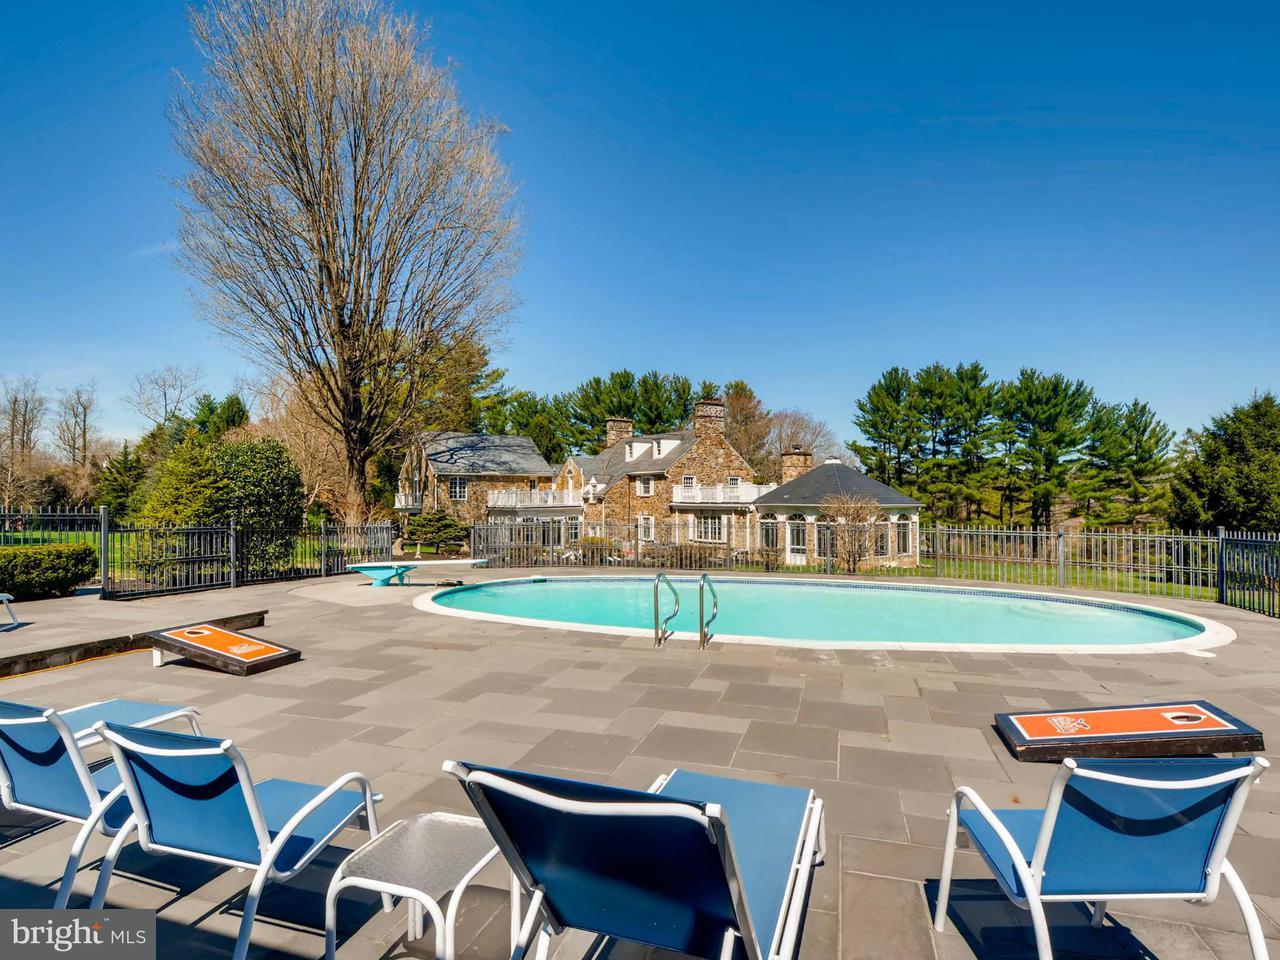 Additional photo for property listing at 501 Seminary Avenue 501 Seminary Avenue Towson, メリーランド 21286 アメリカ合衆国